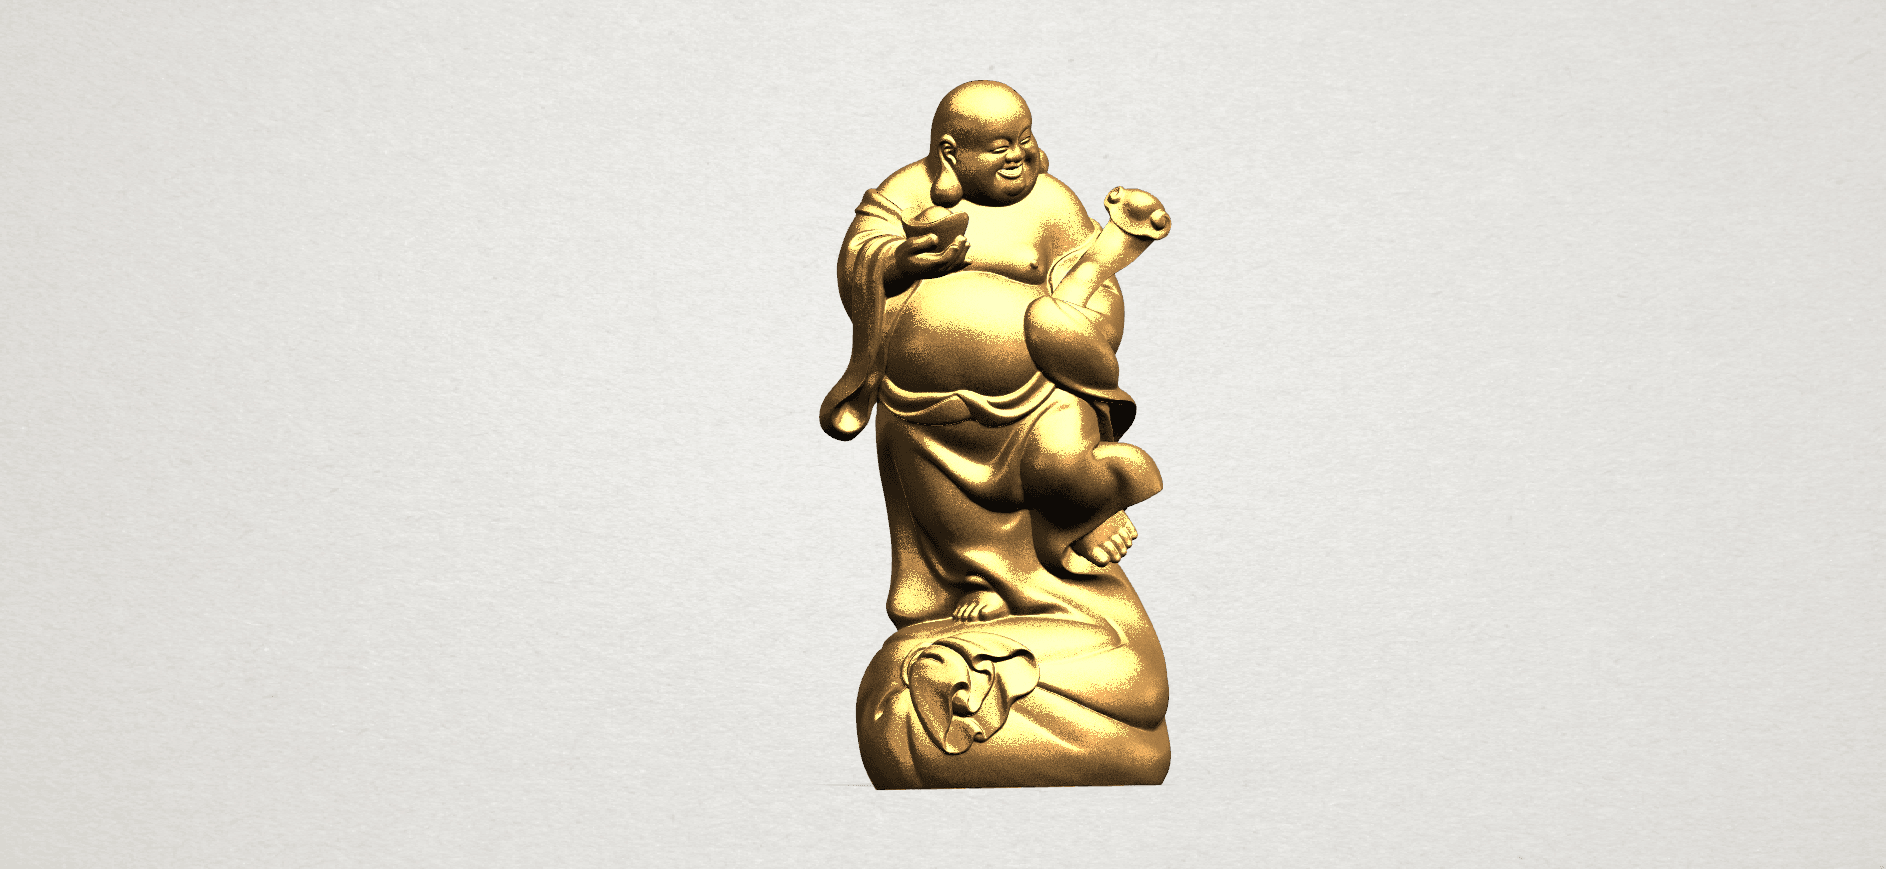 TDA0070 Metteyya Buddha 04 - 88mm - A01.png Download free STL file Metteyya Buddha 04 • 3D printable object, GeorgesNikkei